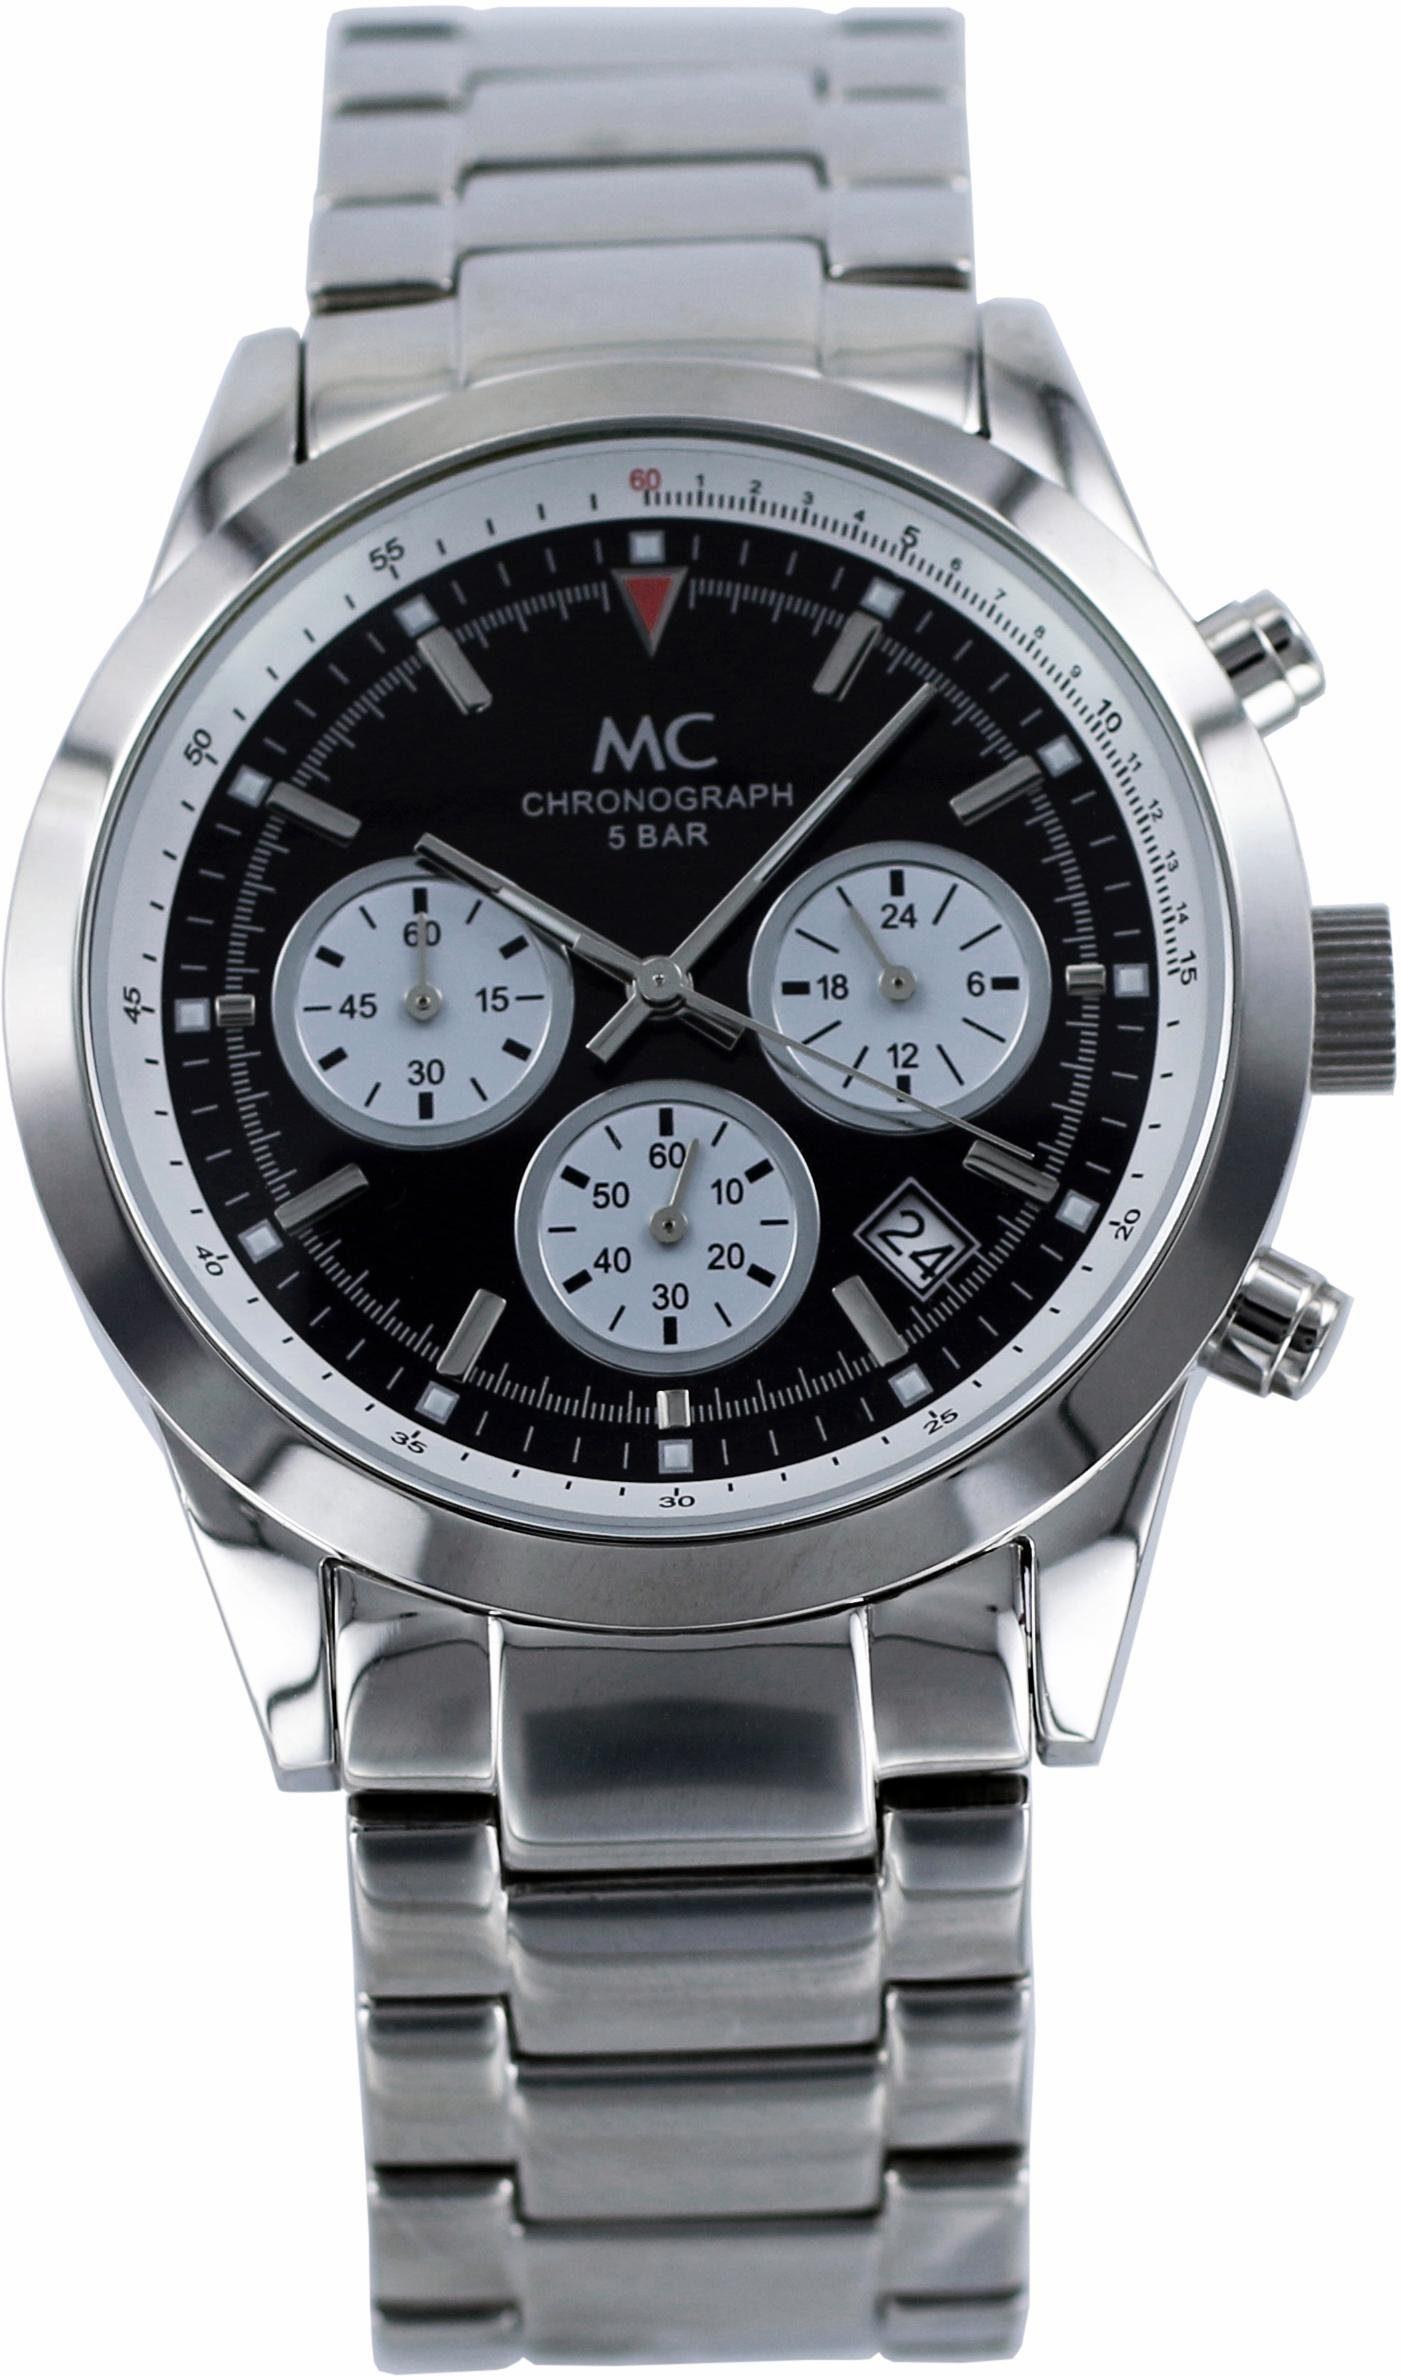 MC Chronograph